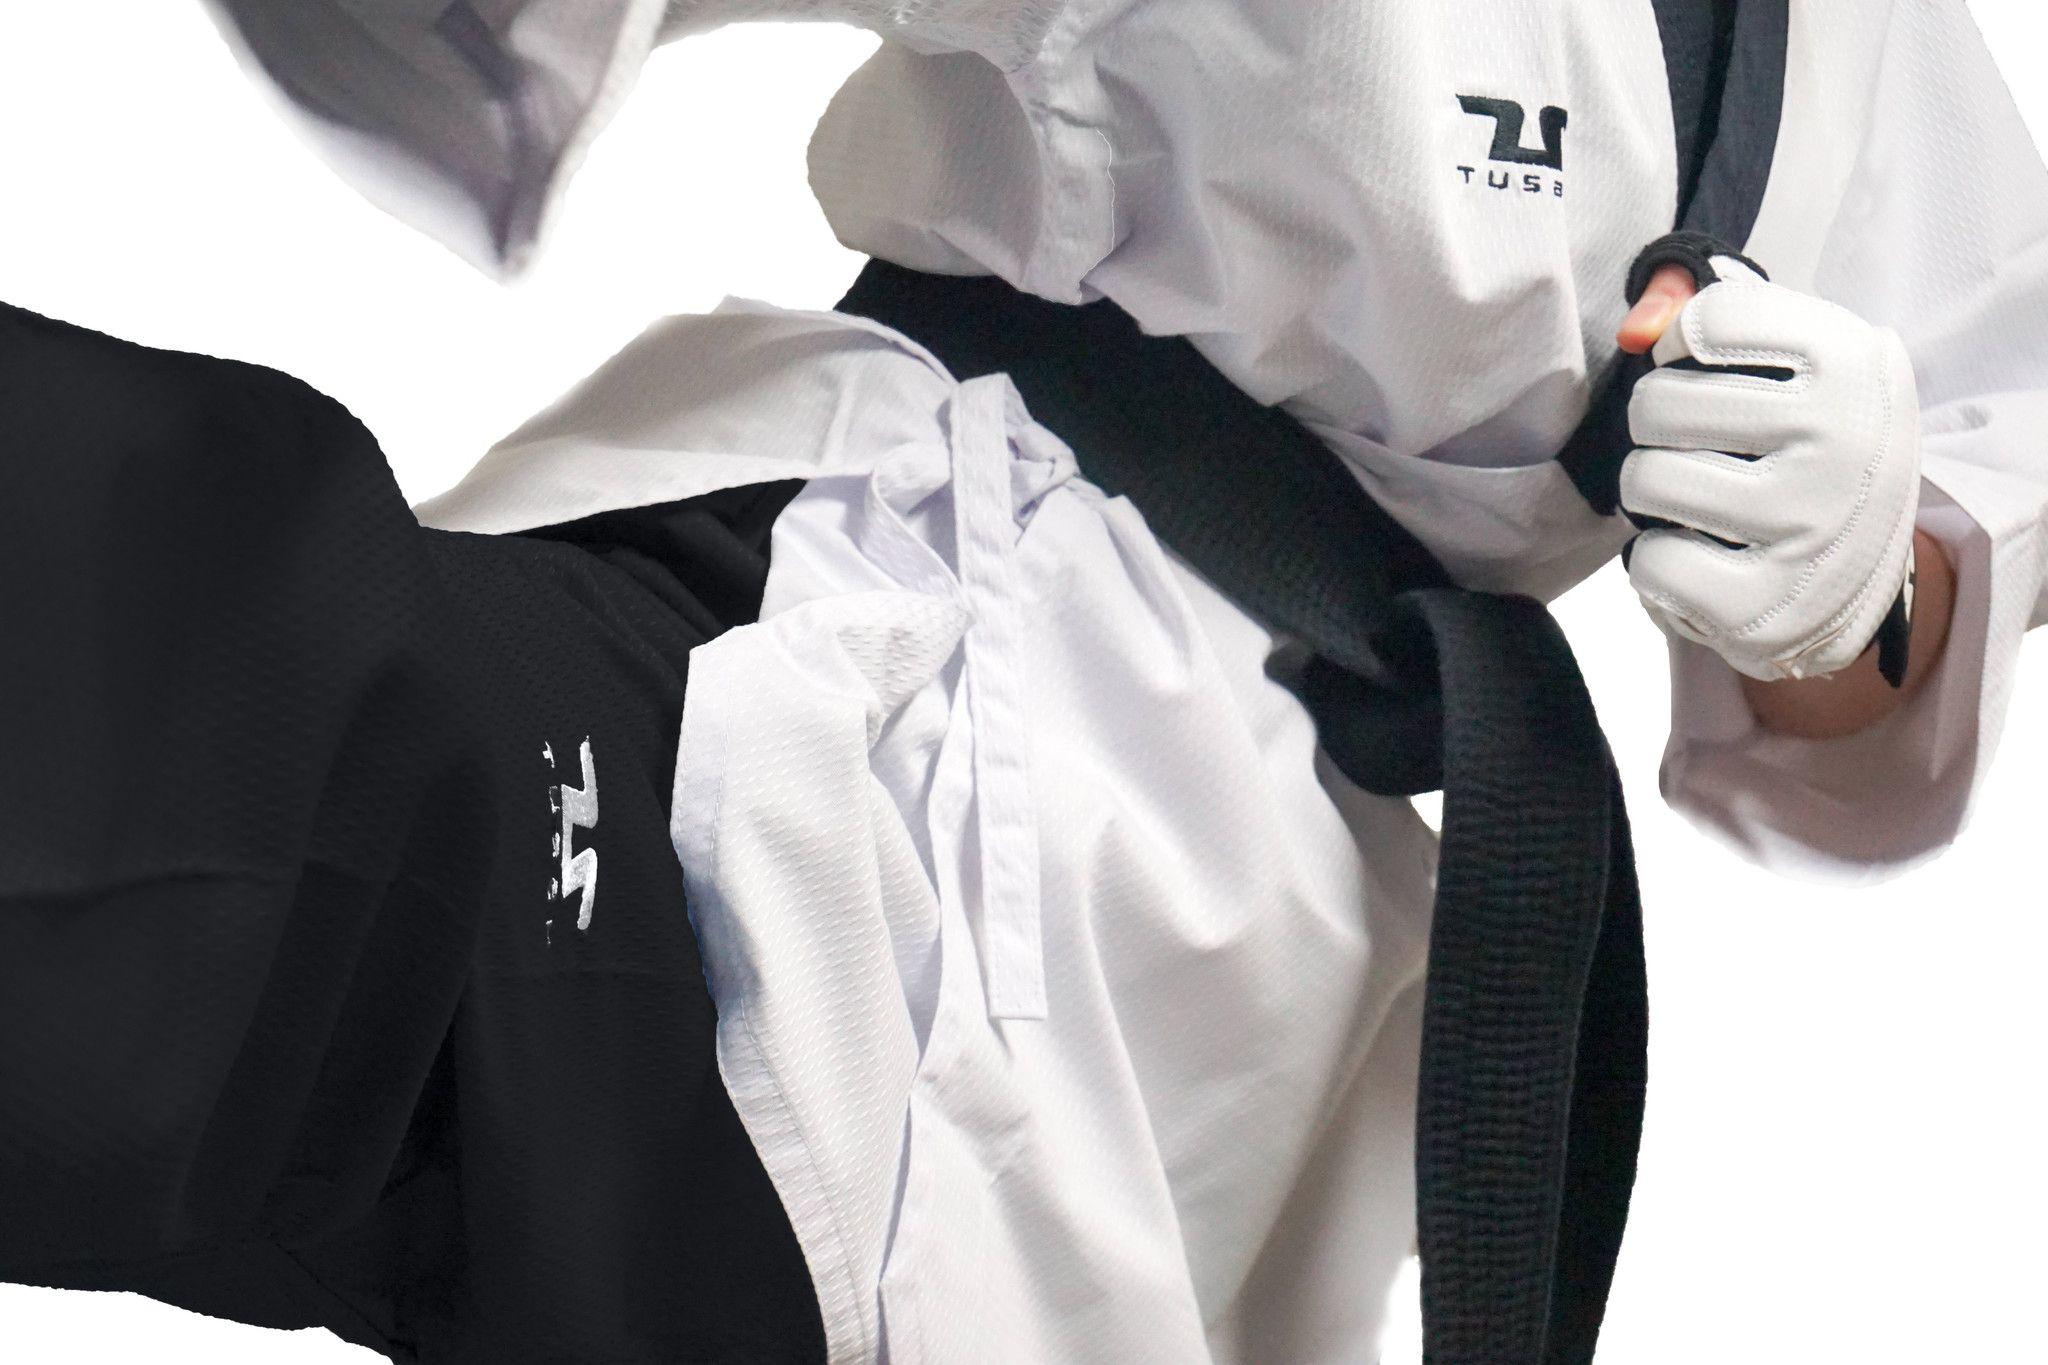 Tusah - Poomsae Professional Maschile per Taekwondo Omologato WT Made in Korea per forme e competizioni